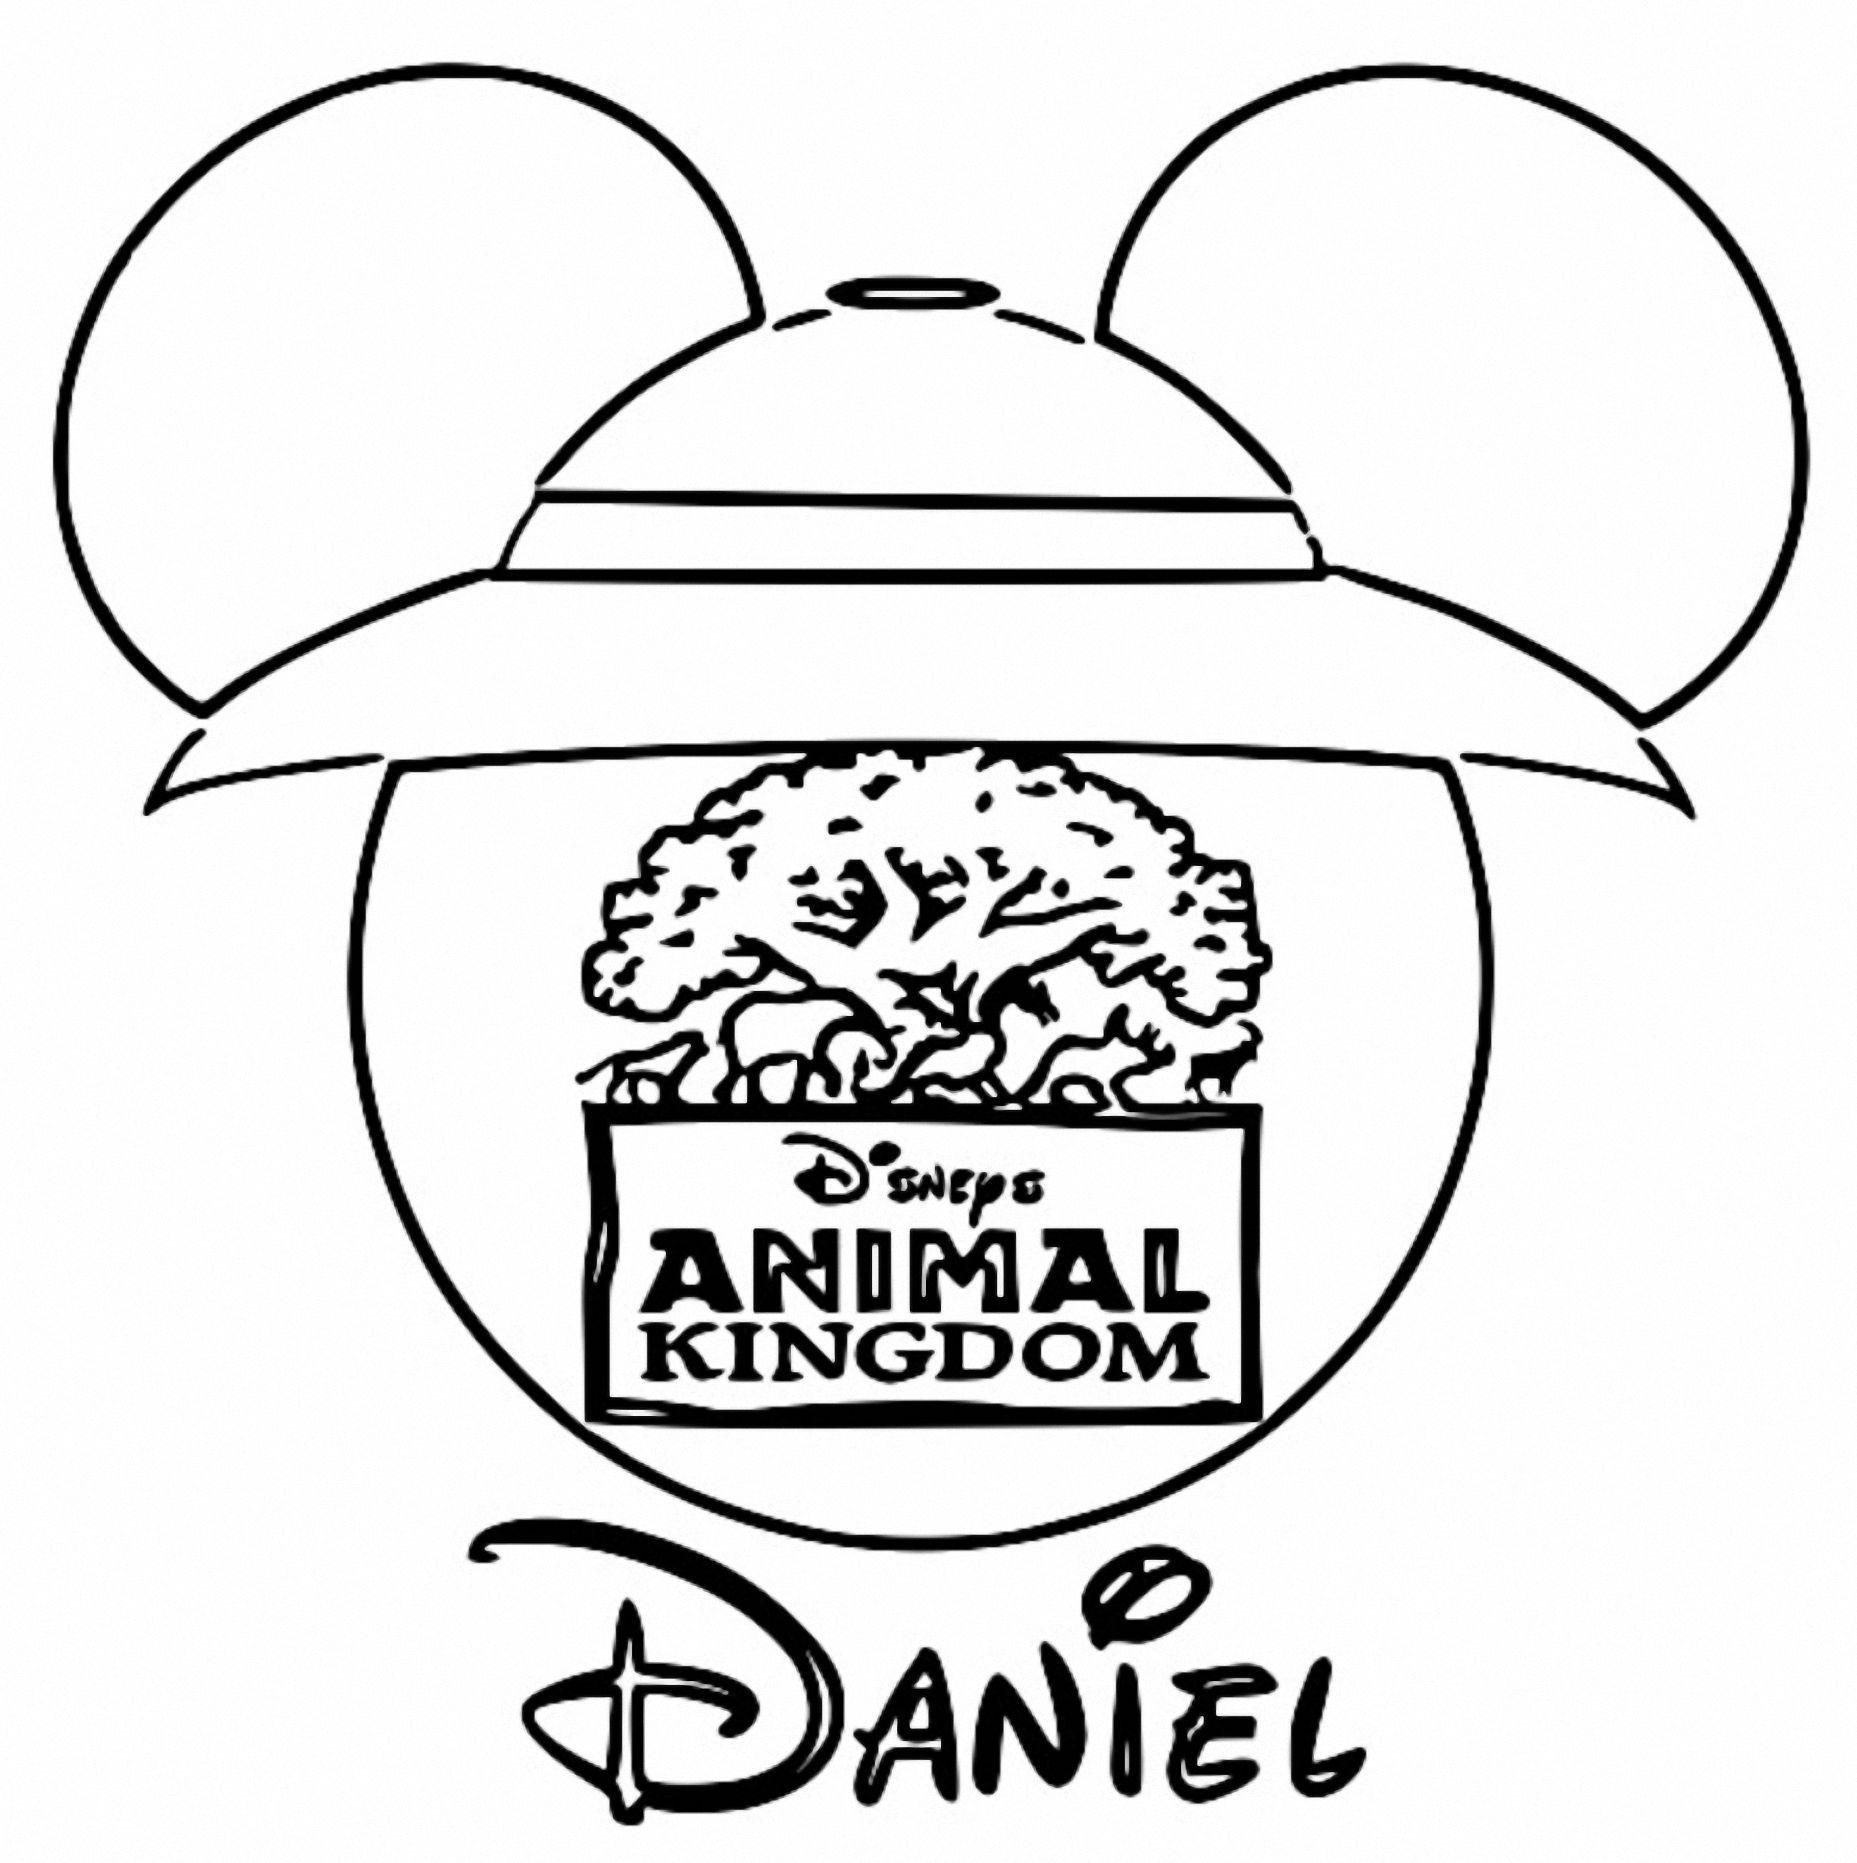 coloring animal kingdom animal kingdom color me draw me a millie marotta adult kingdom coloring animal